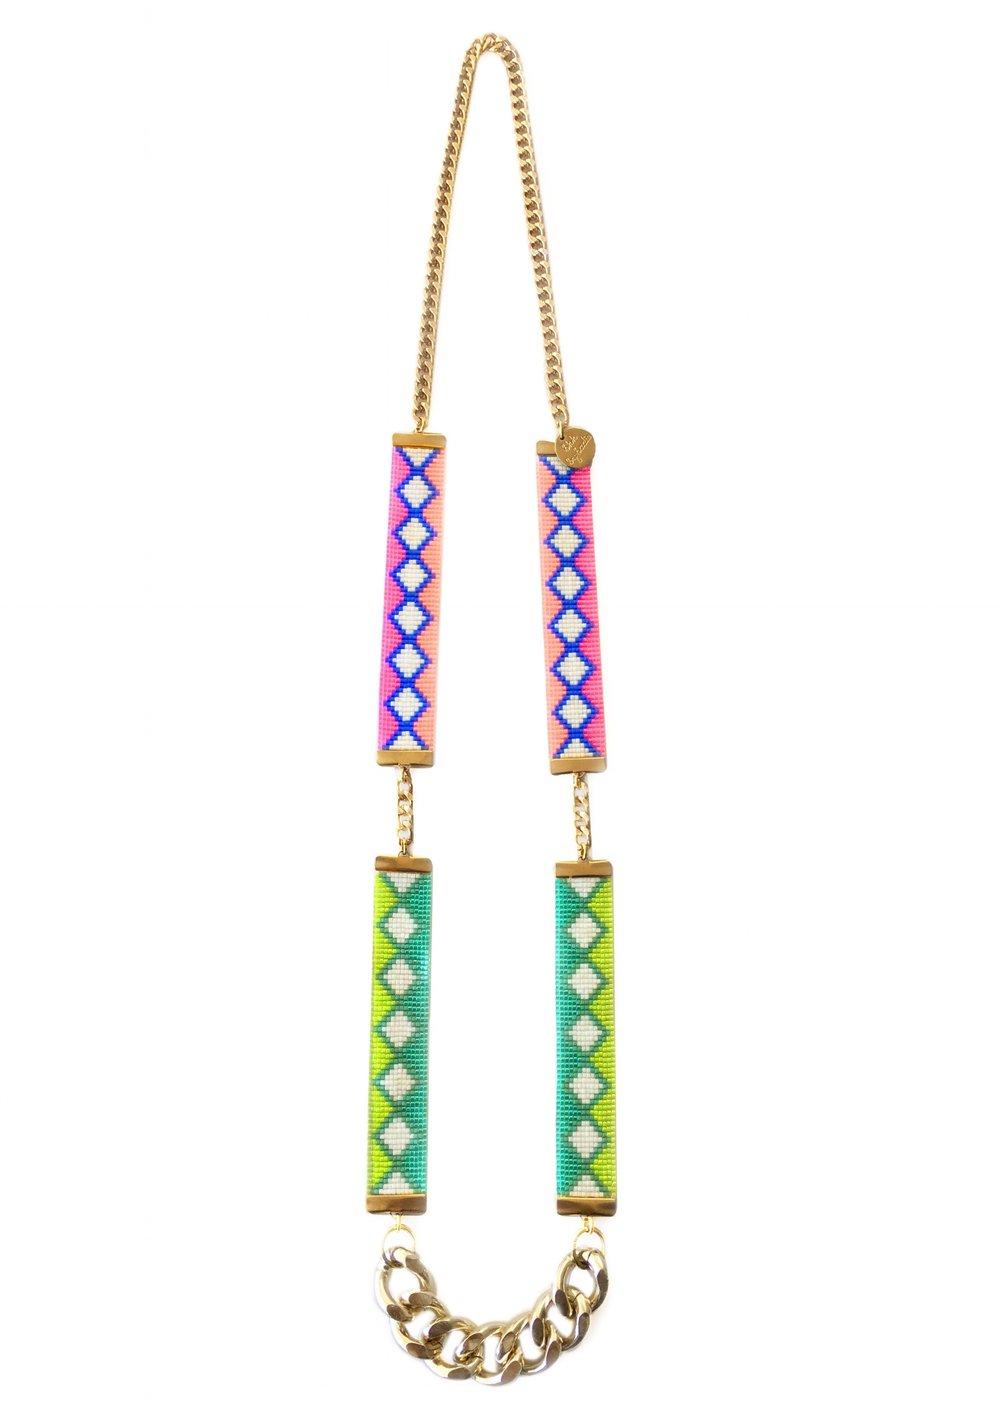 Copy of bright statement necklace designer jewelry by British fashion designer shh by sadie